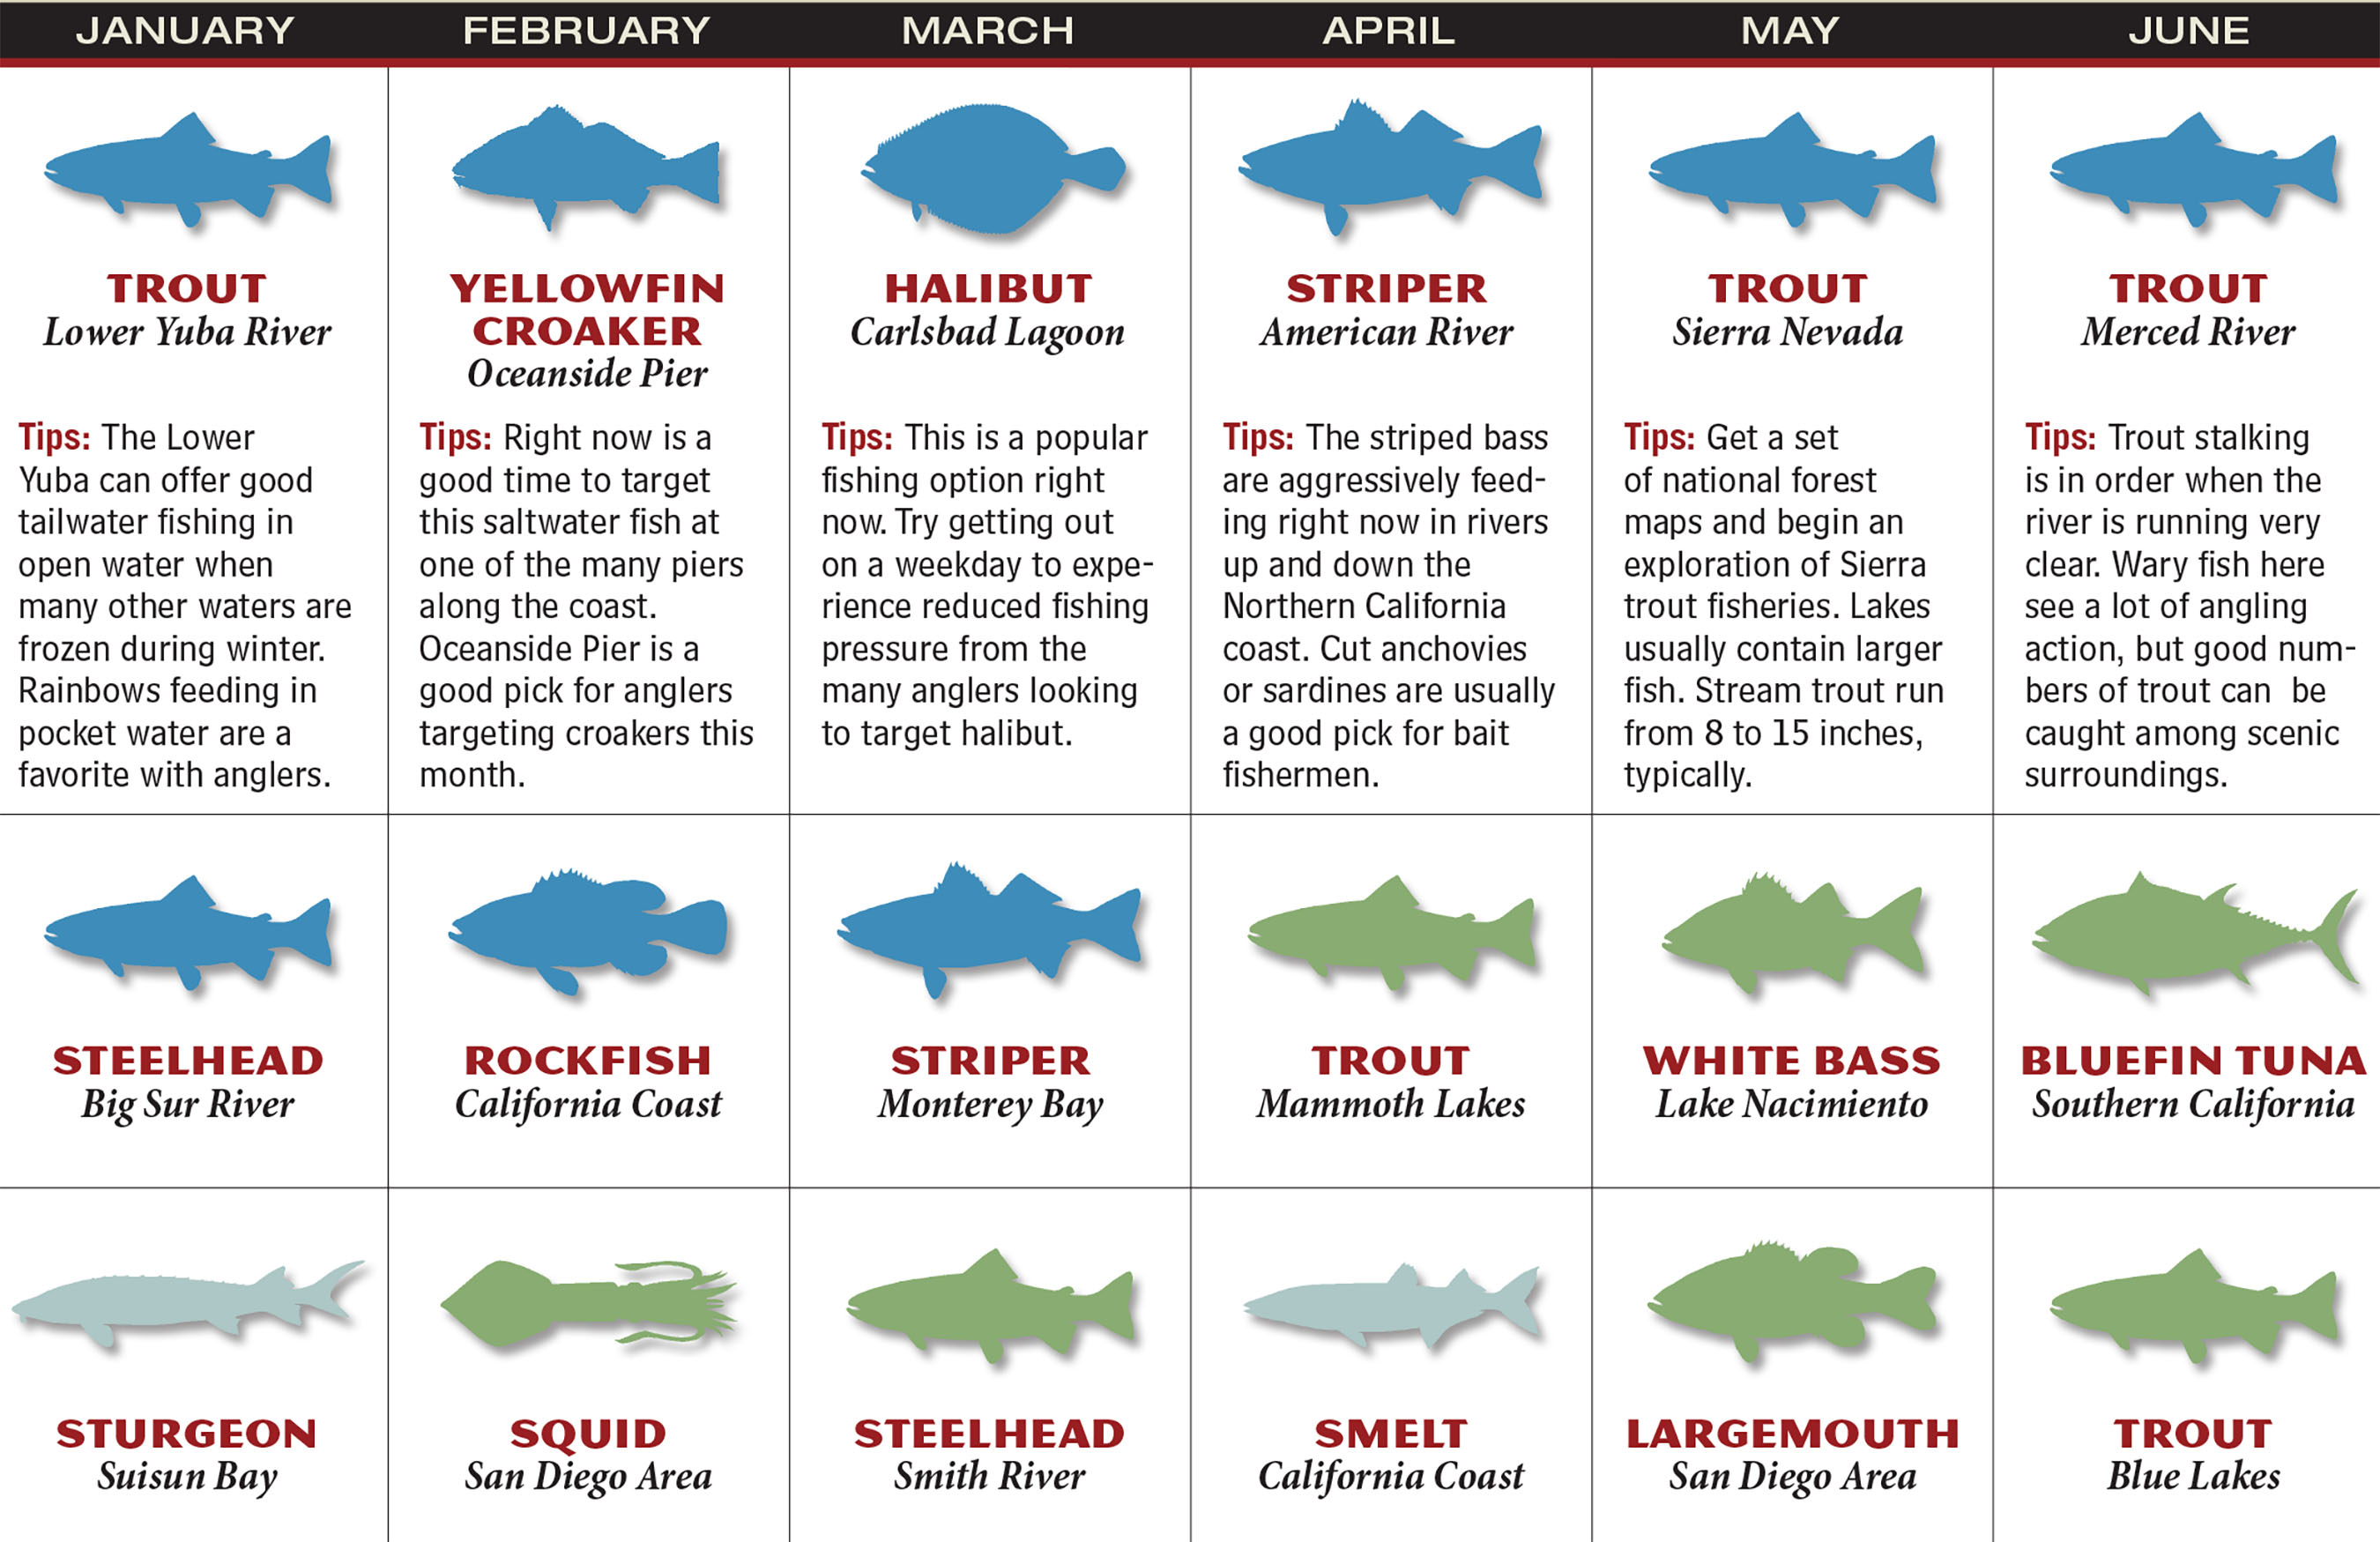 2017 California Fishing Forecast